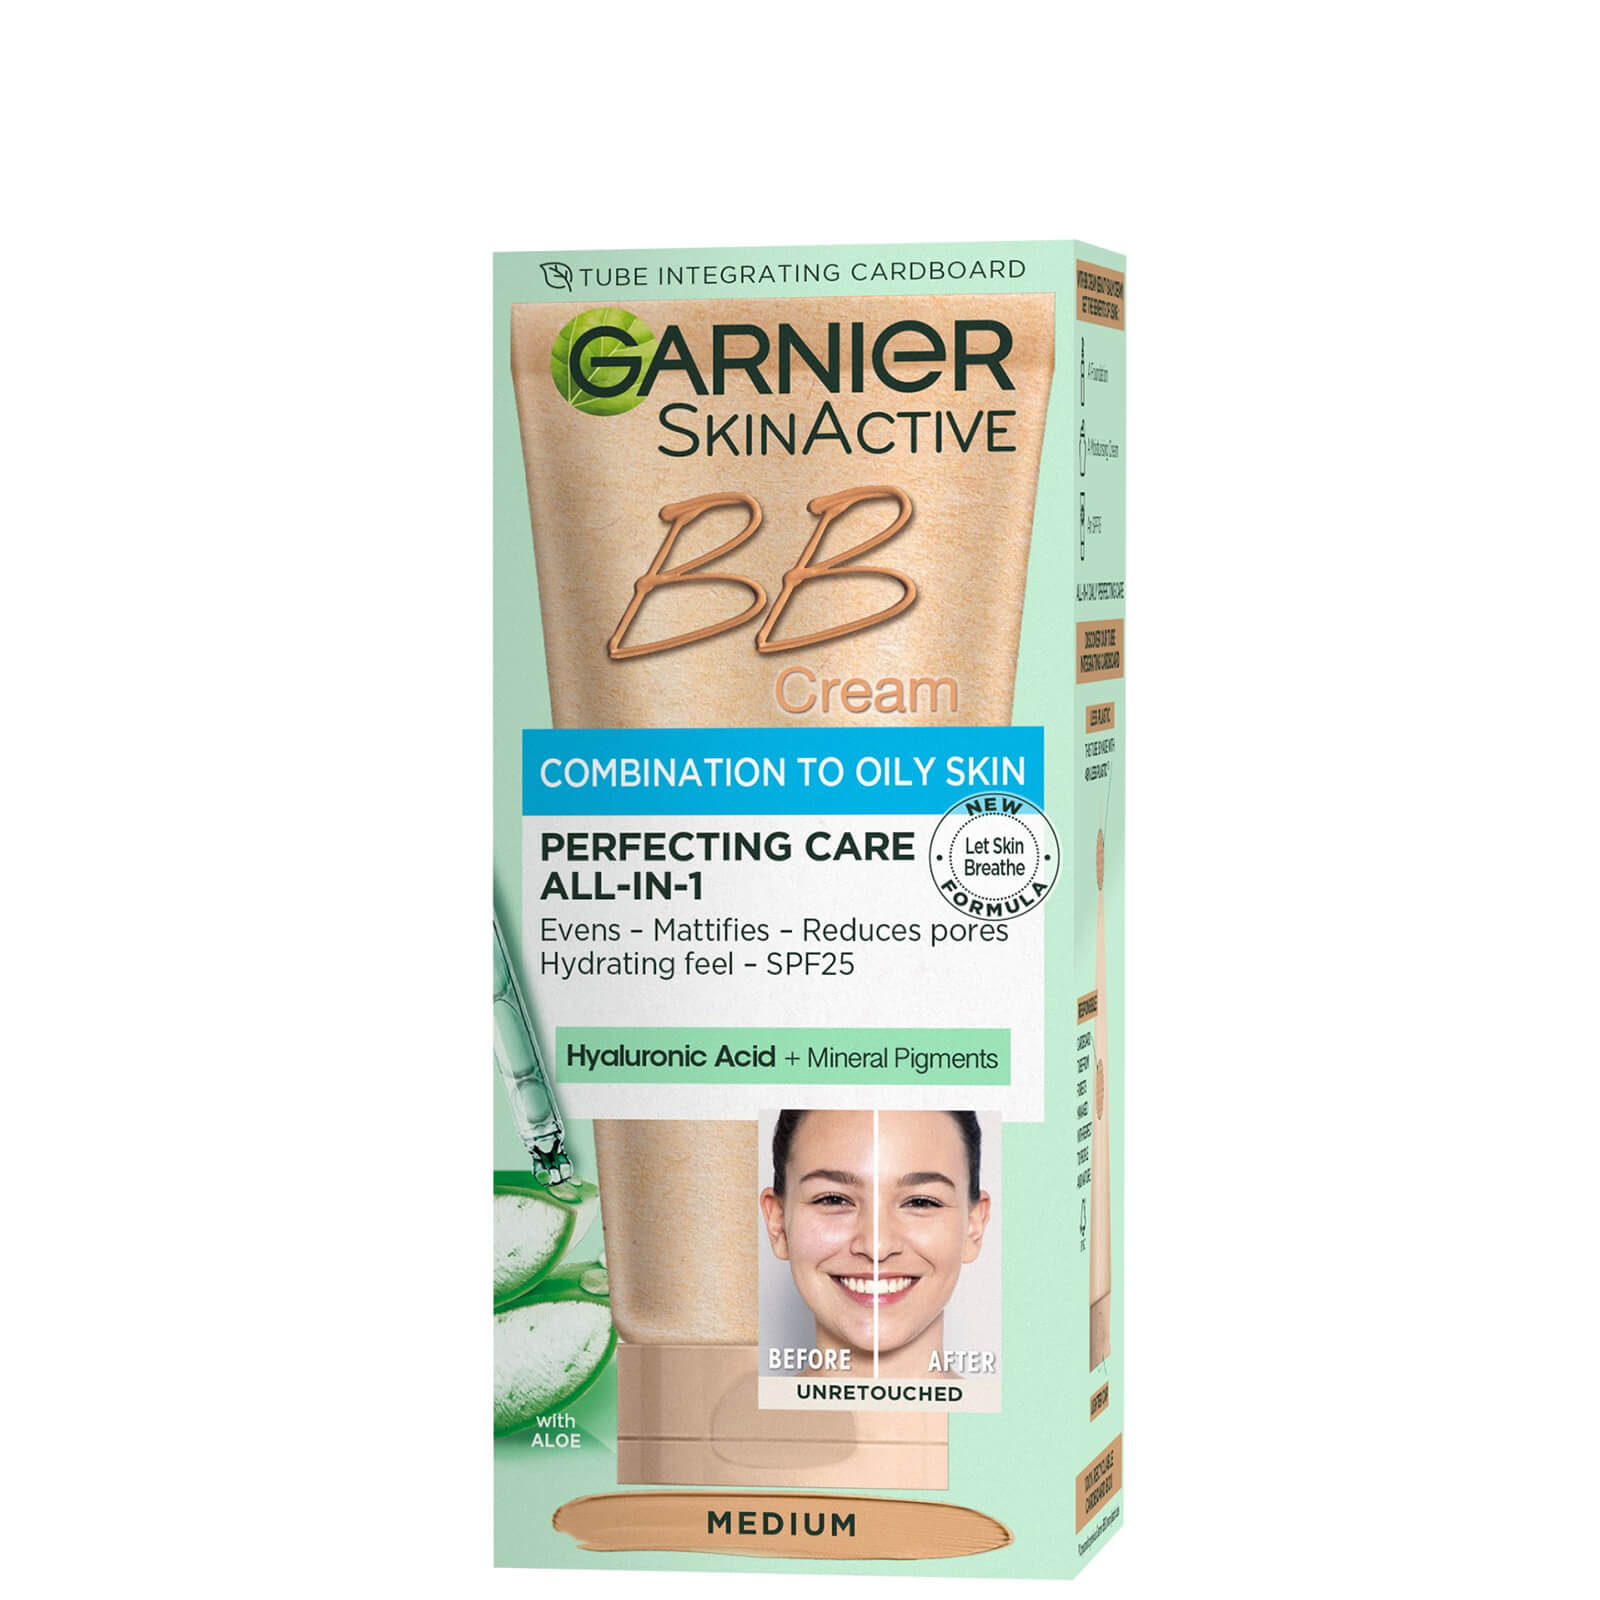 Купить Garnier BB Cream Oil Free Tinted Moisturiser (Various Shades) - Medium